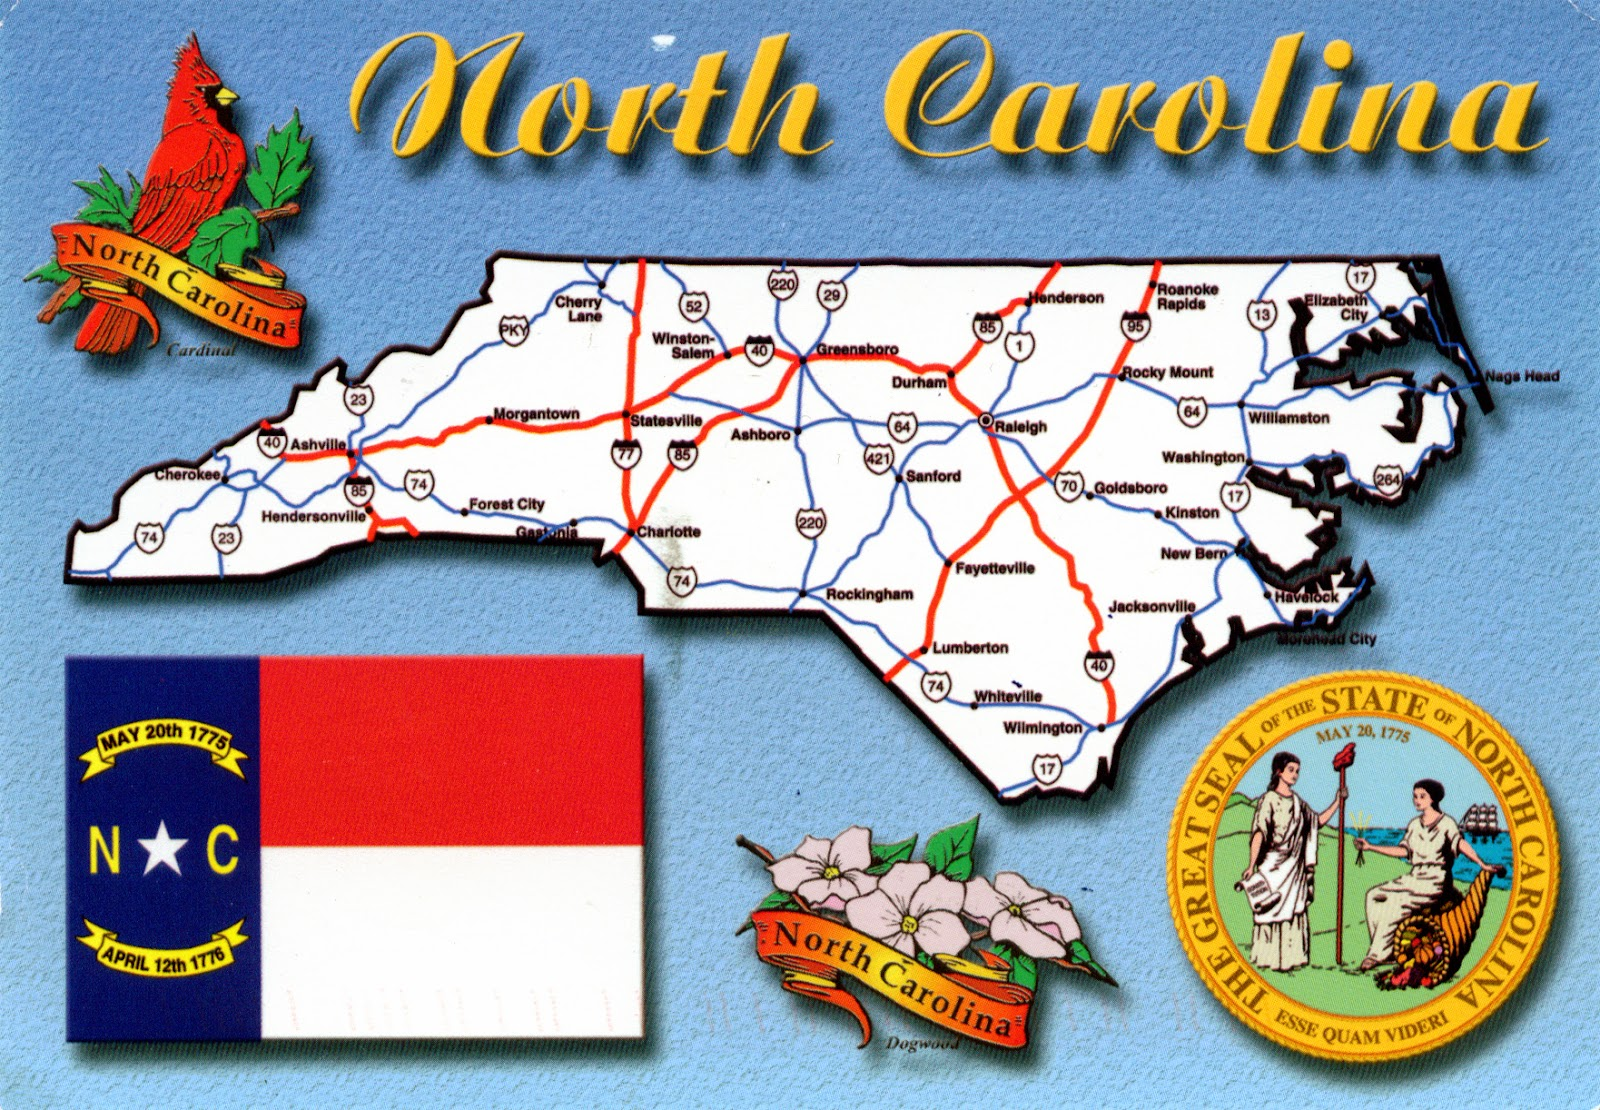 United States Map North Carolina.World Come To My Home 1247 United States North Carolina North